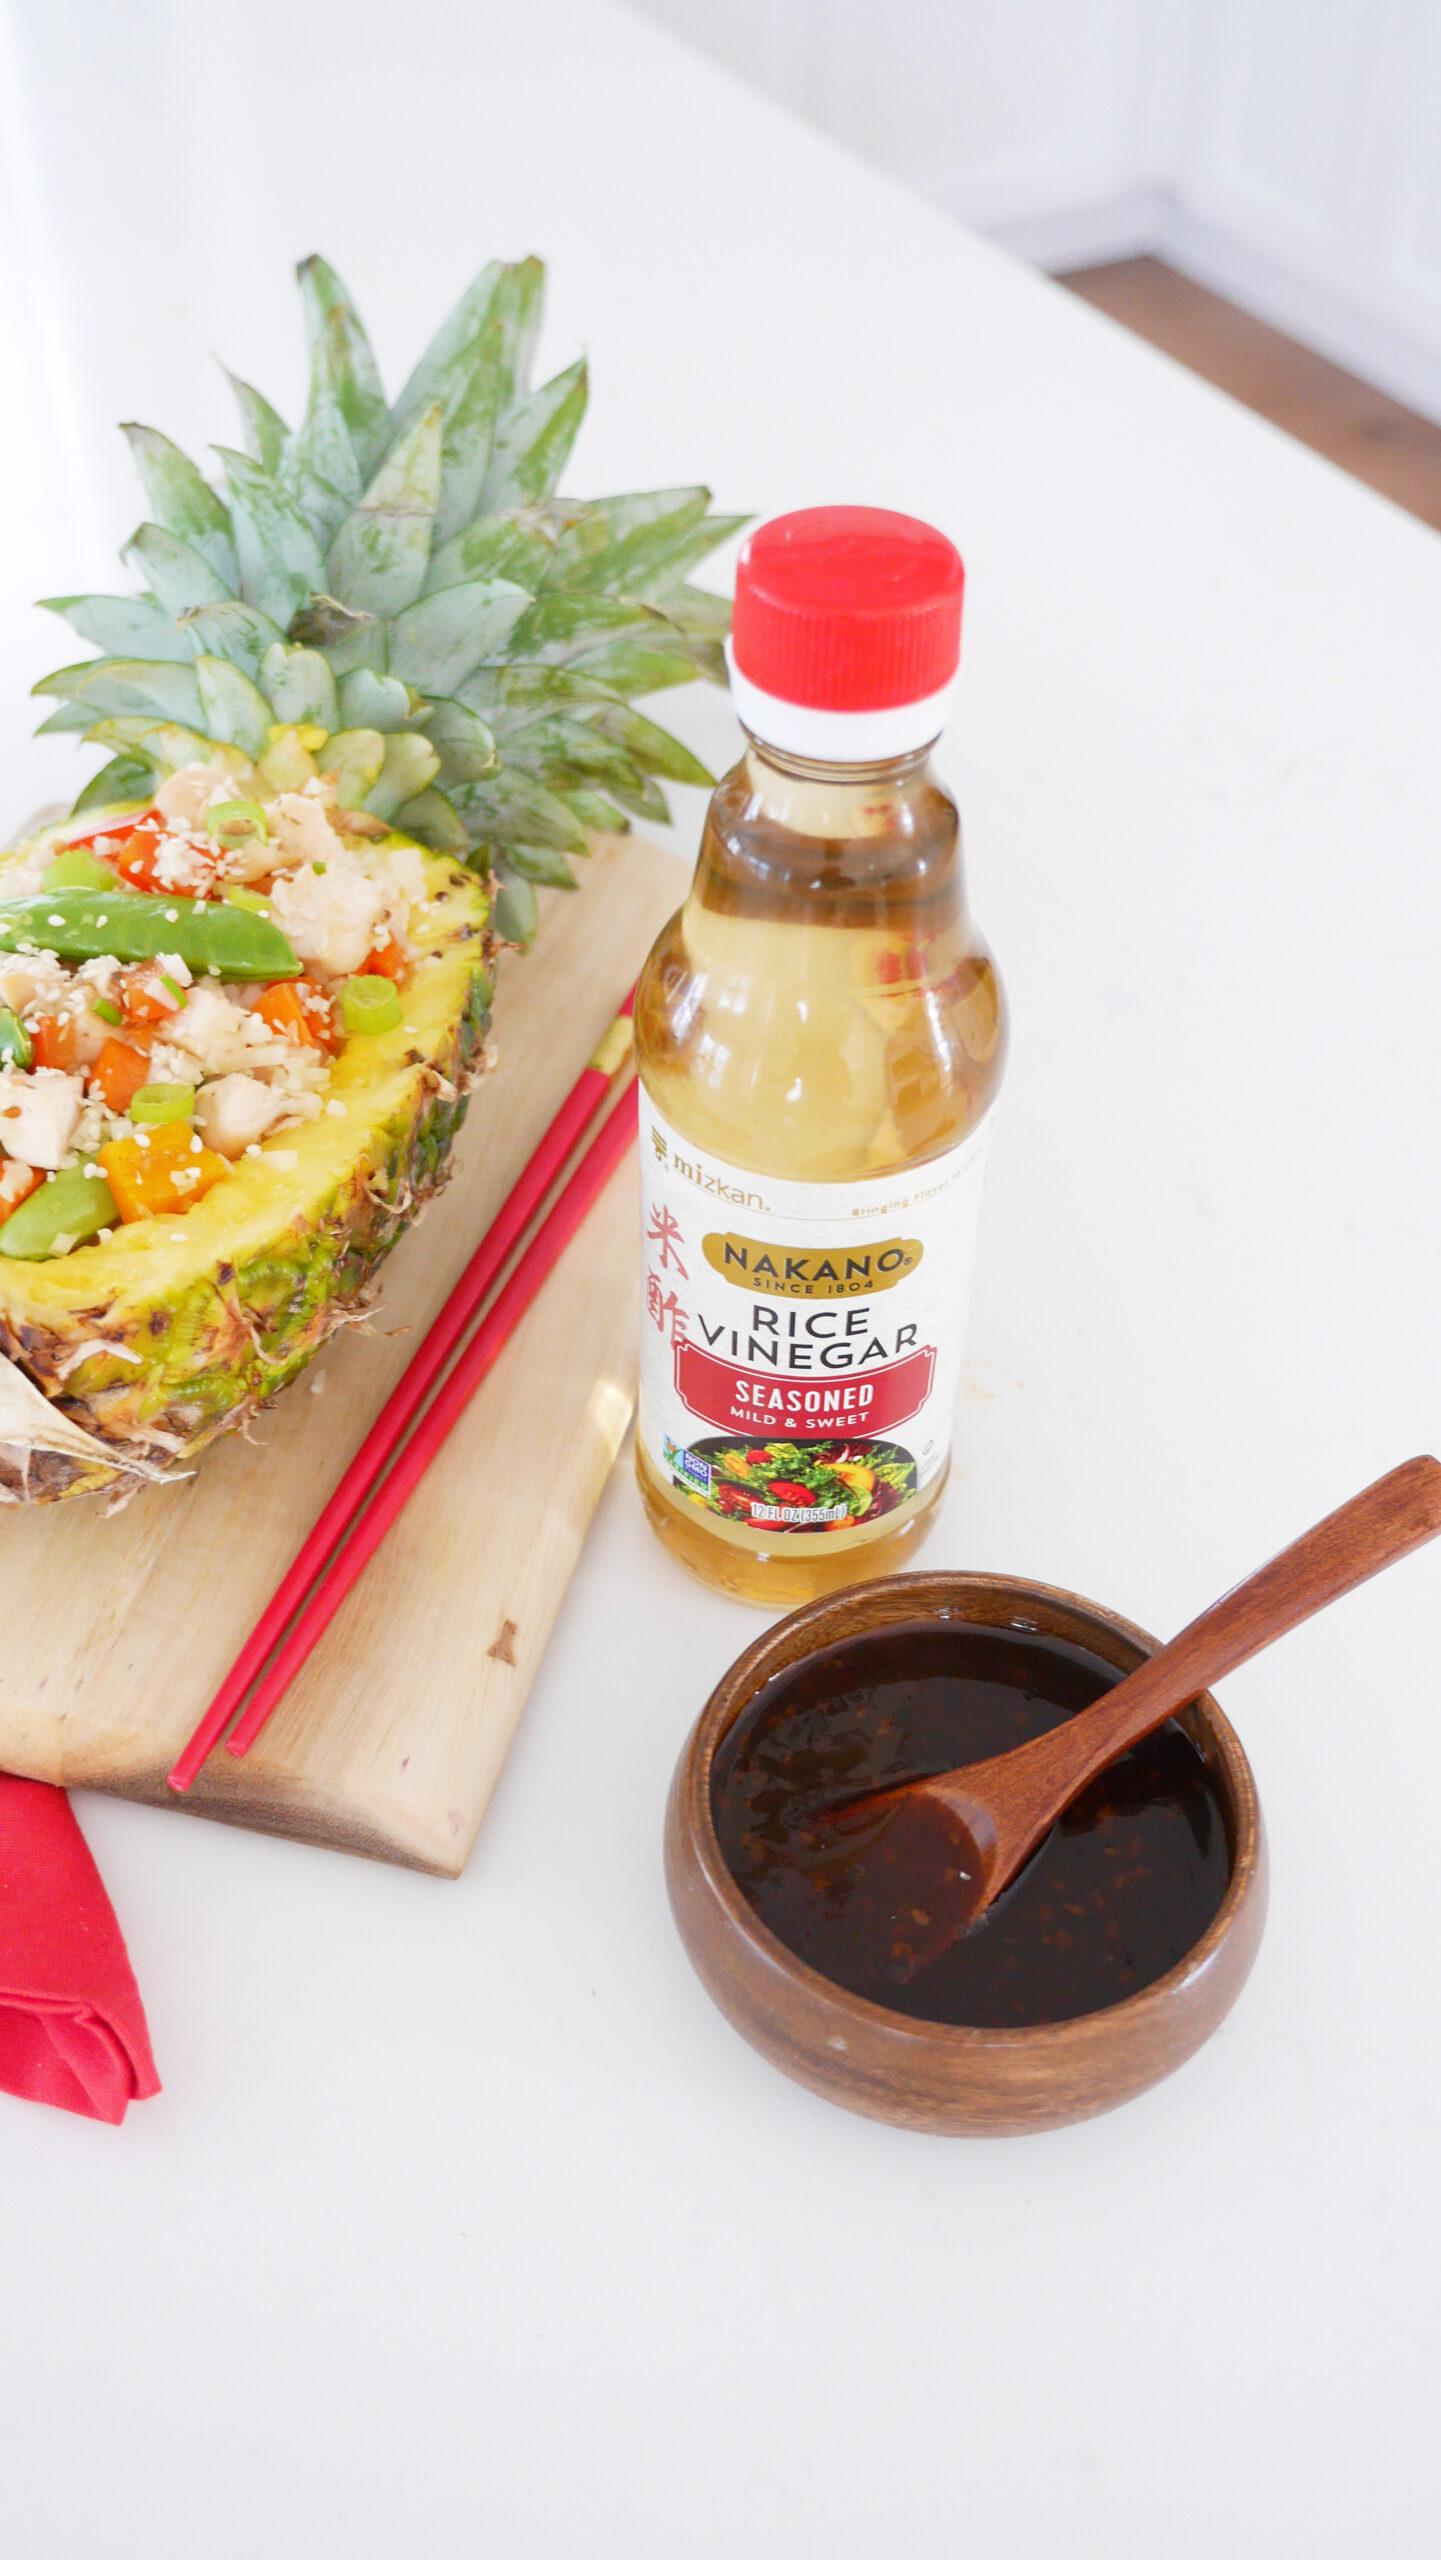 NAKANO Seasoned Rice Vinegar